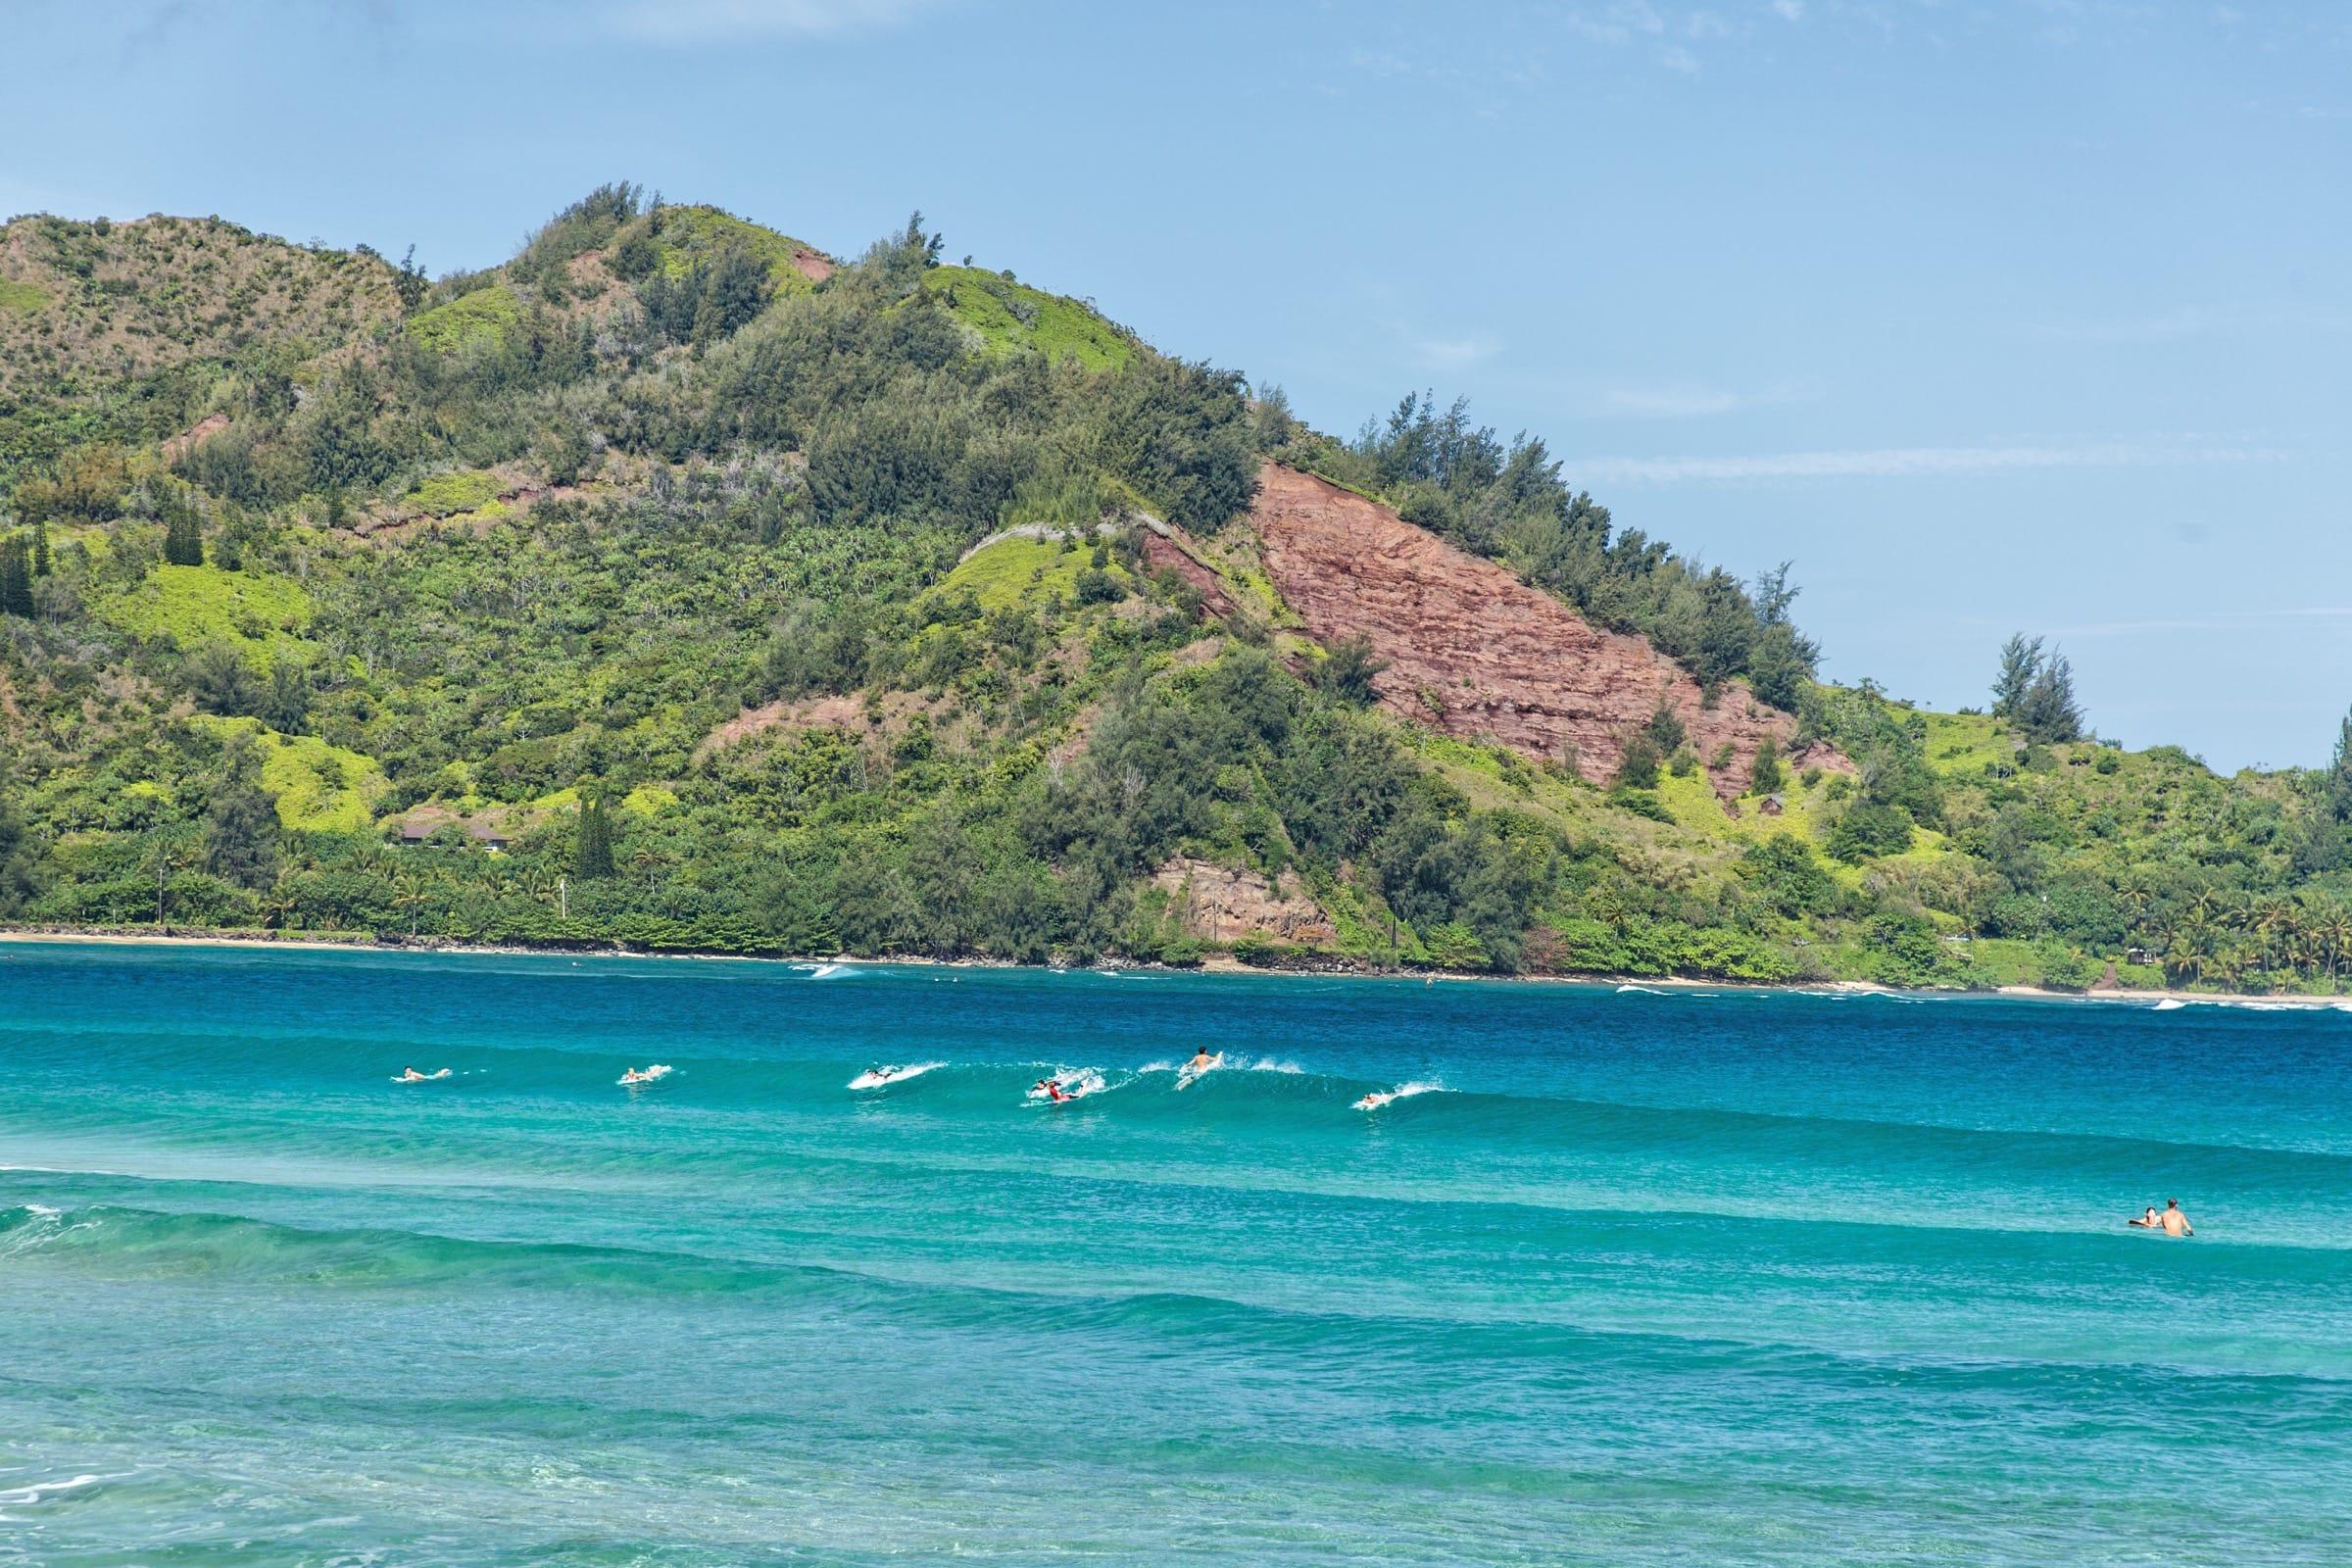 Hanalei Bay Surfing